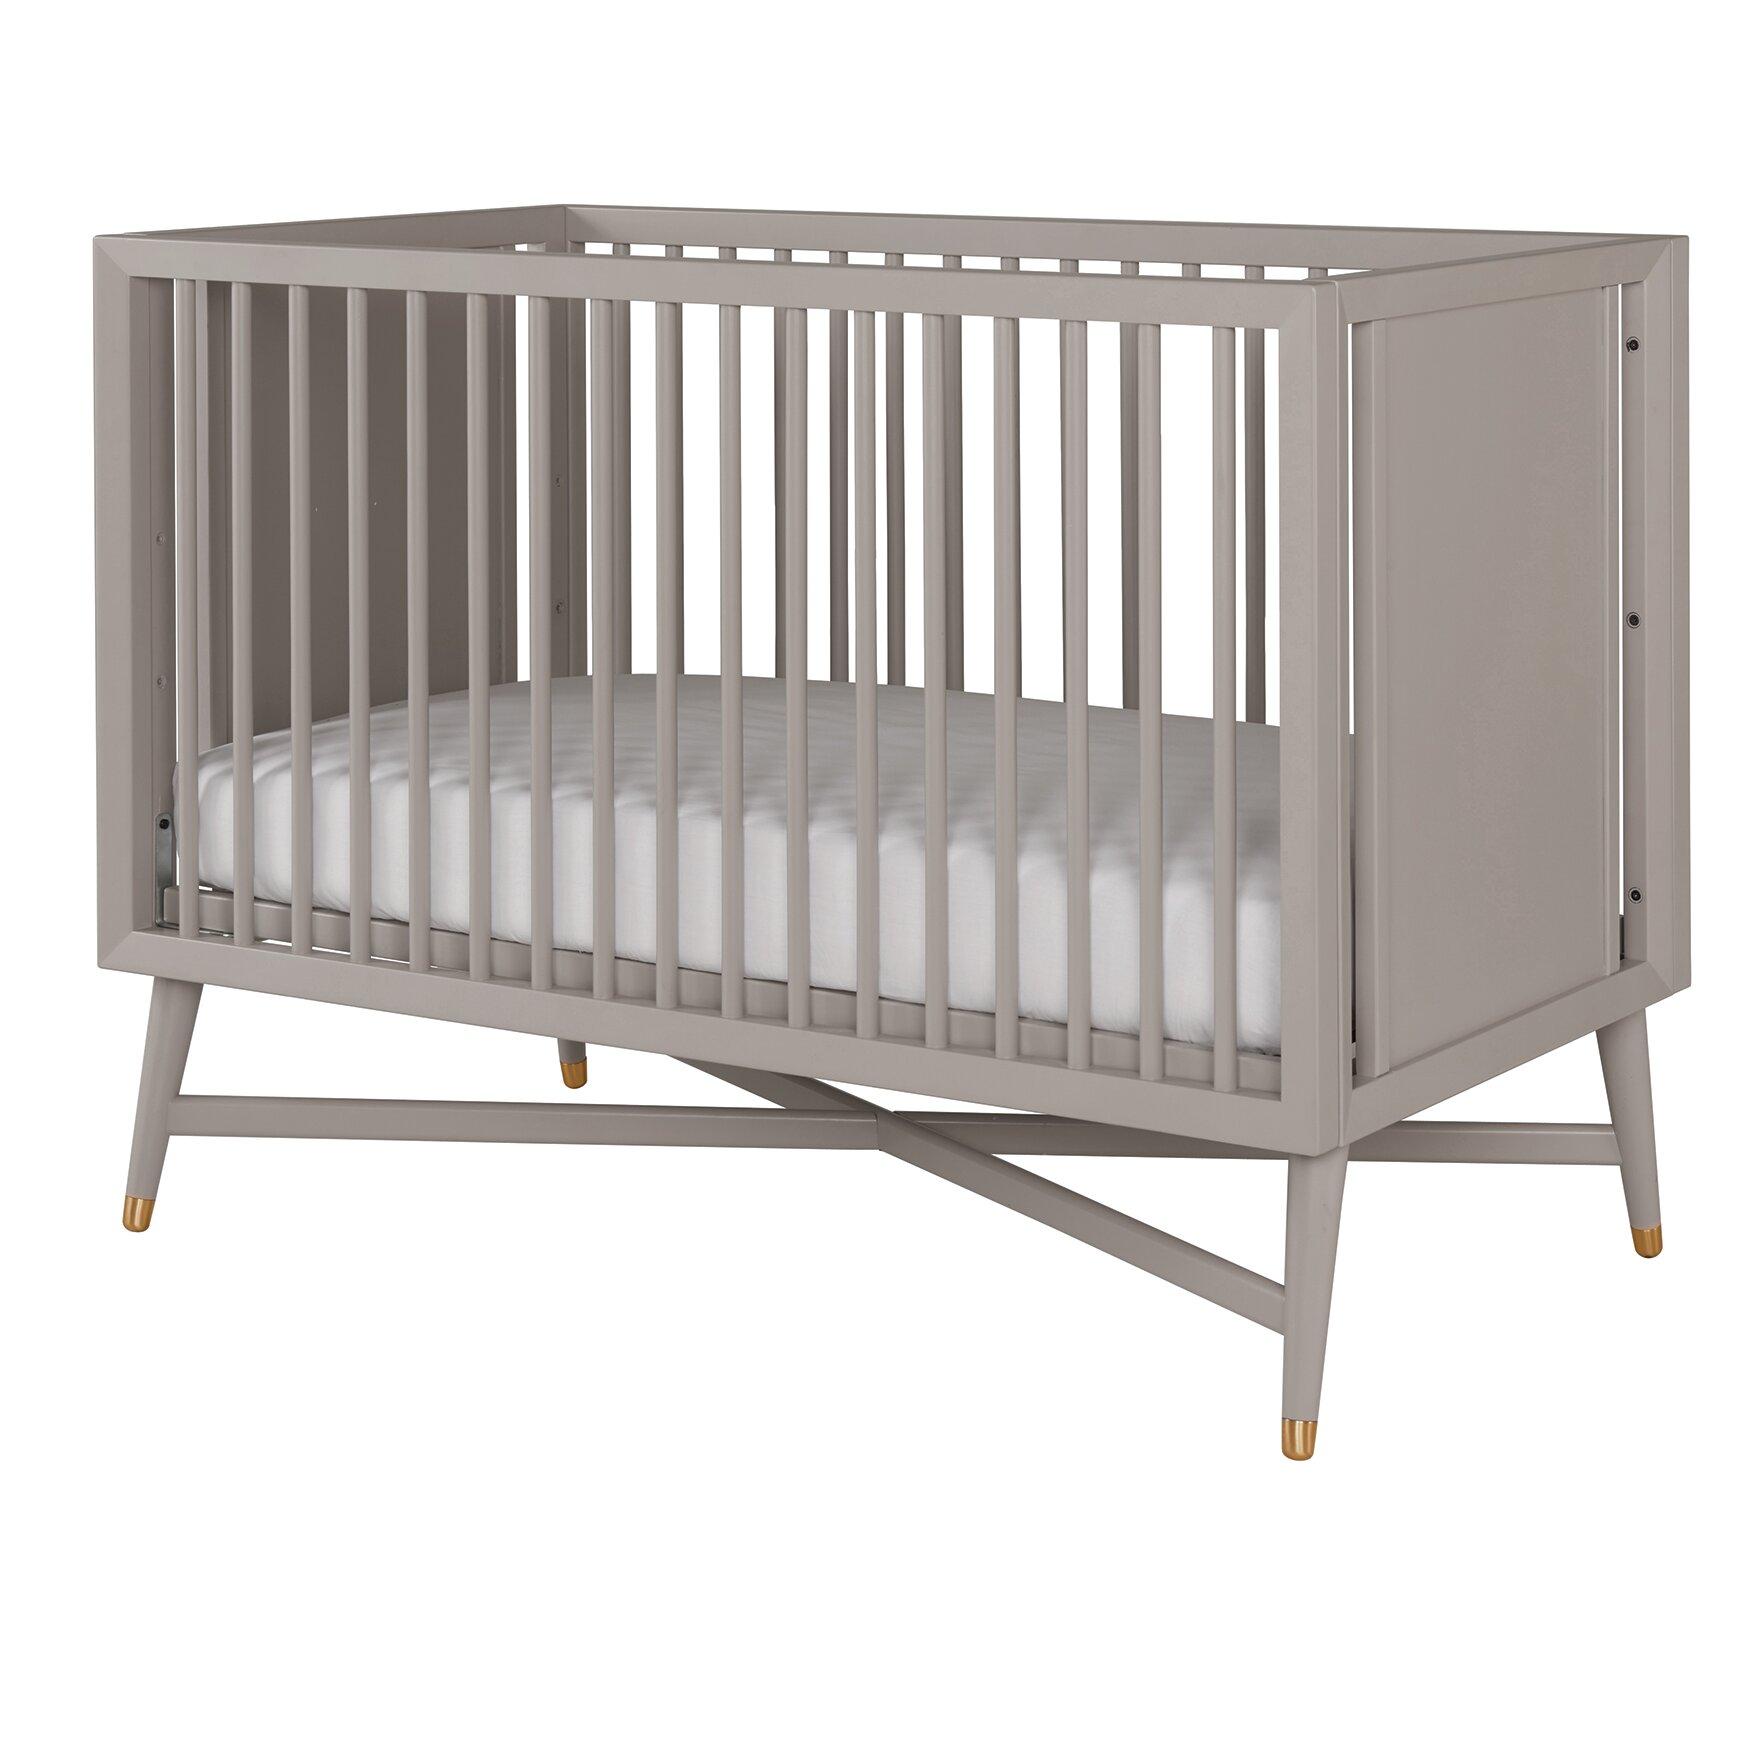 Crib for sale charleston sc - Dwellstudio Mid Century Convertible Crib